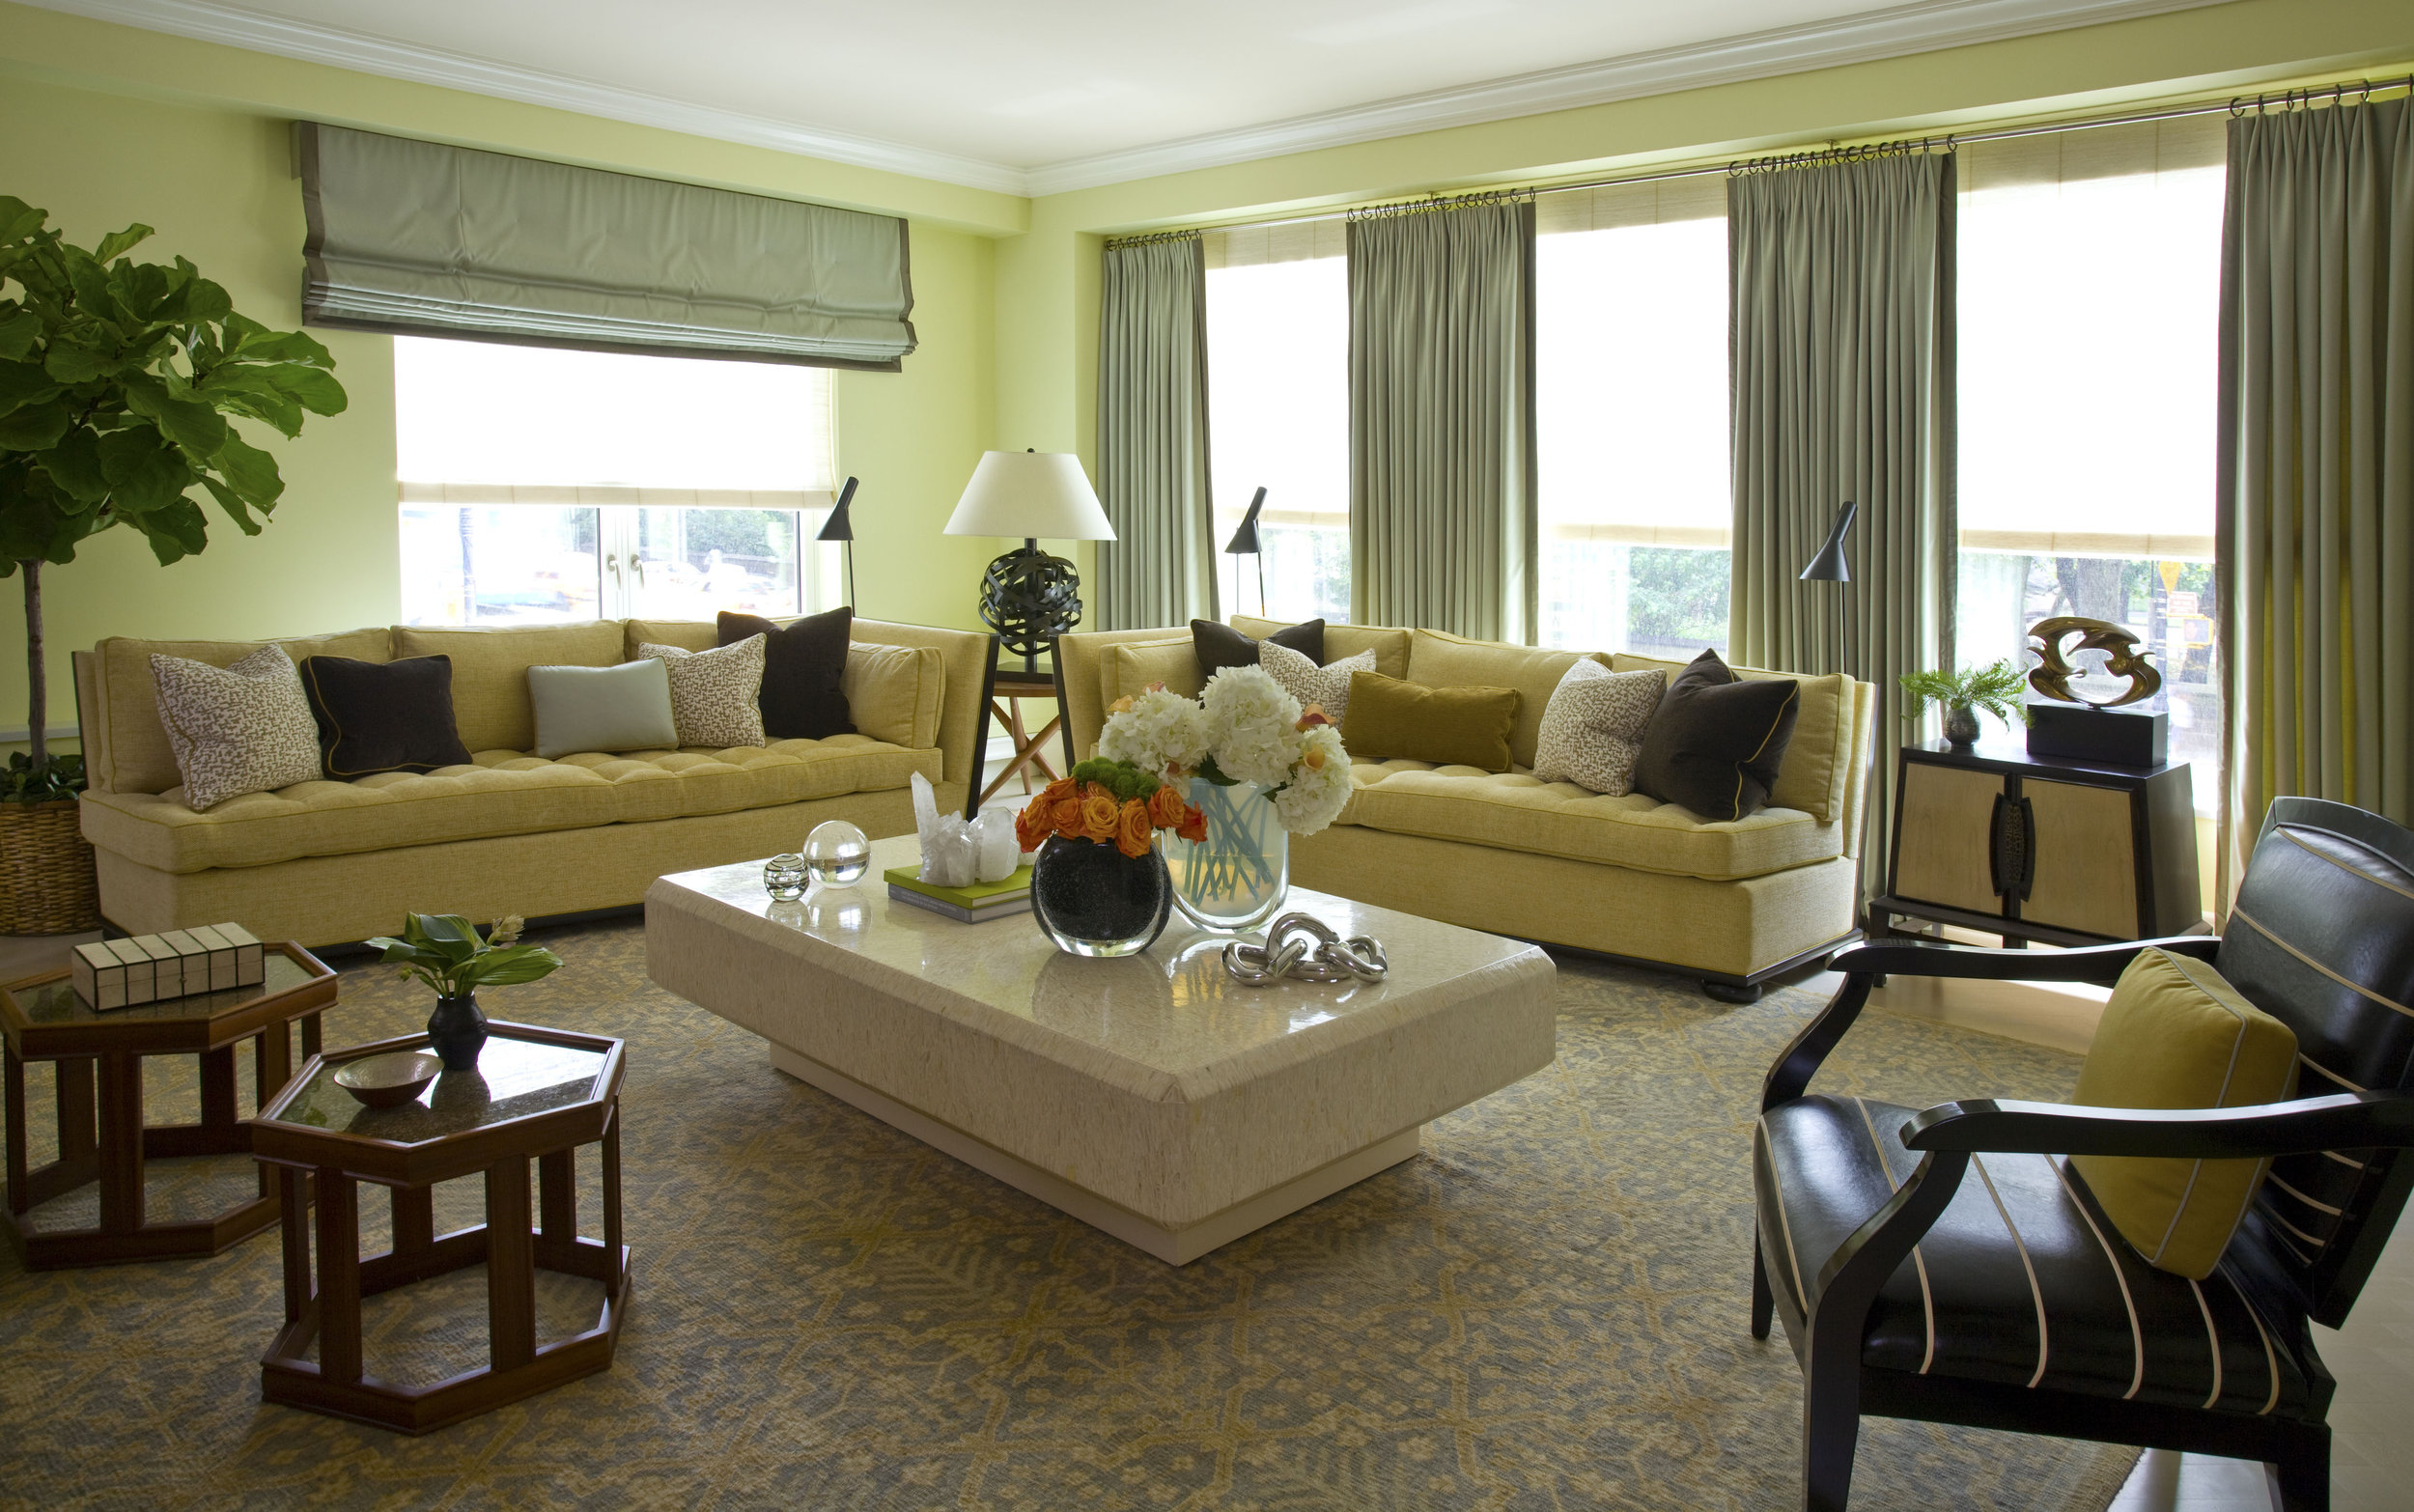 7 - CPW-7 Living Room.jpg